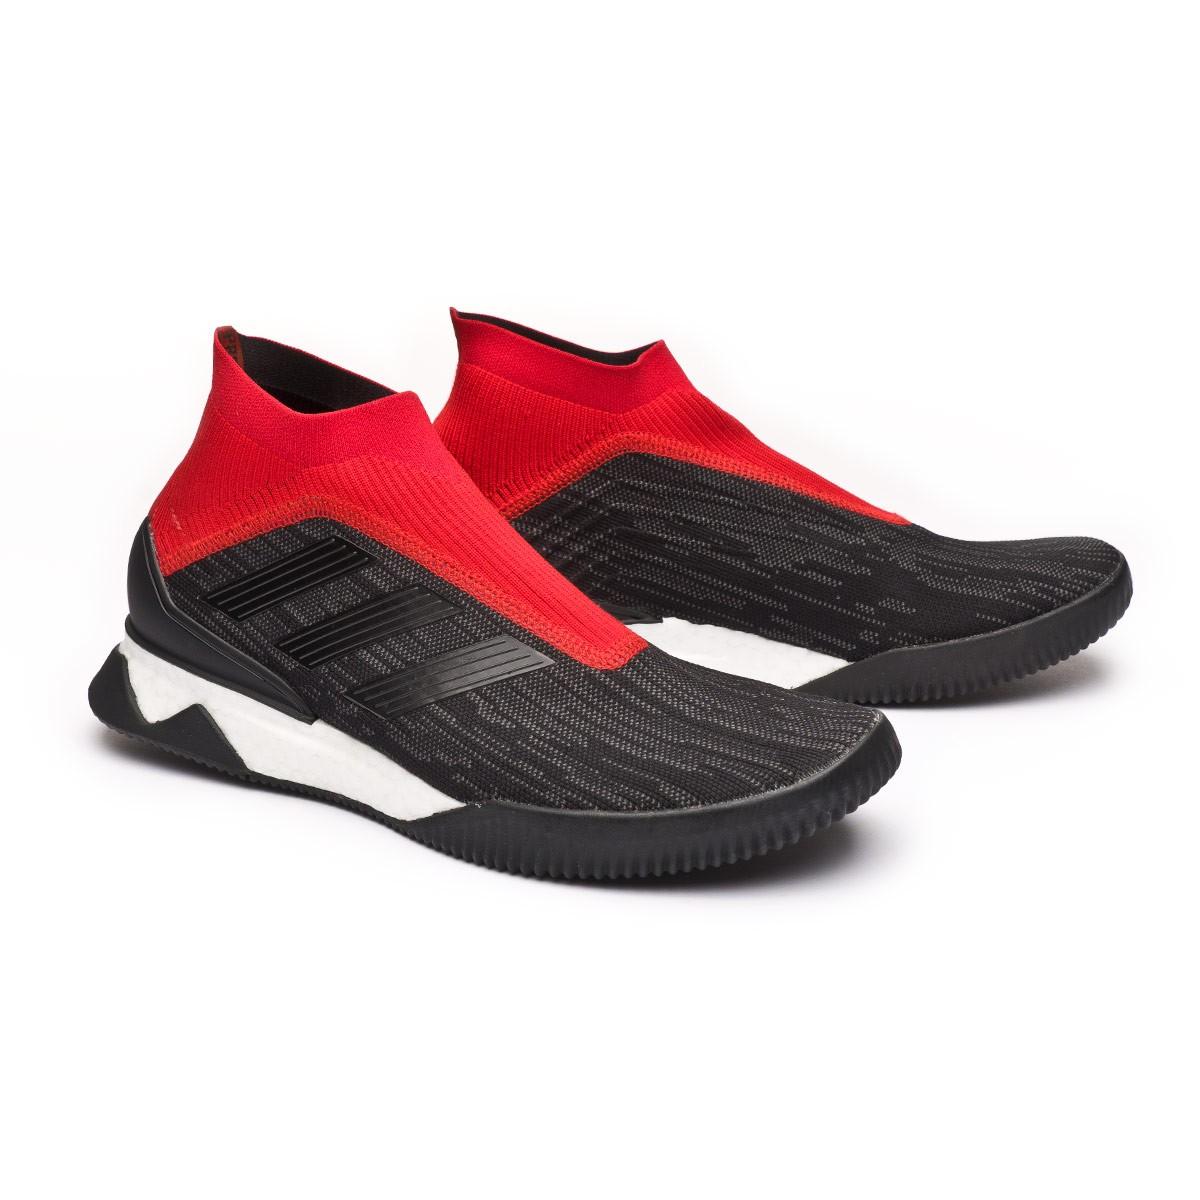 df1b1a381bf29 Trainers adidas Predator Tango 18+ TR Ultraboost Black-Red ...